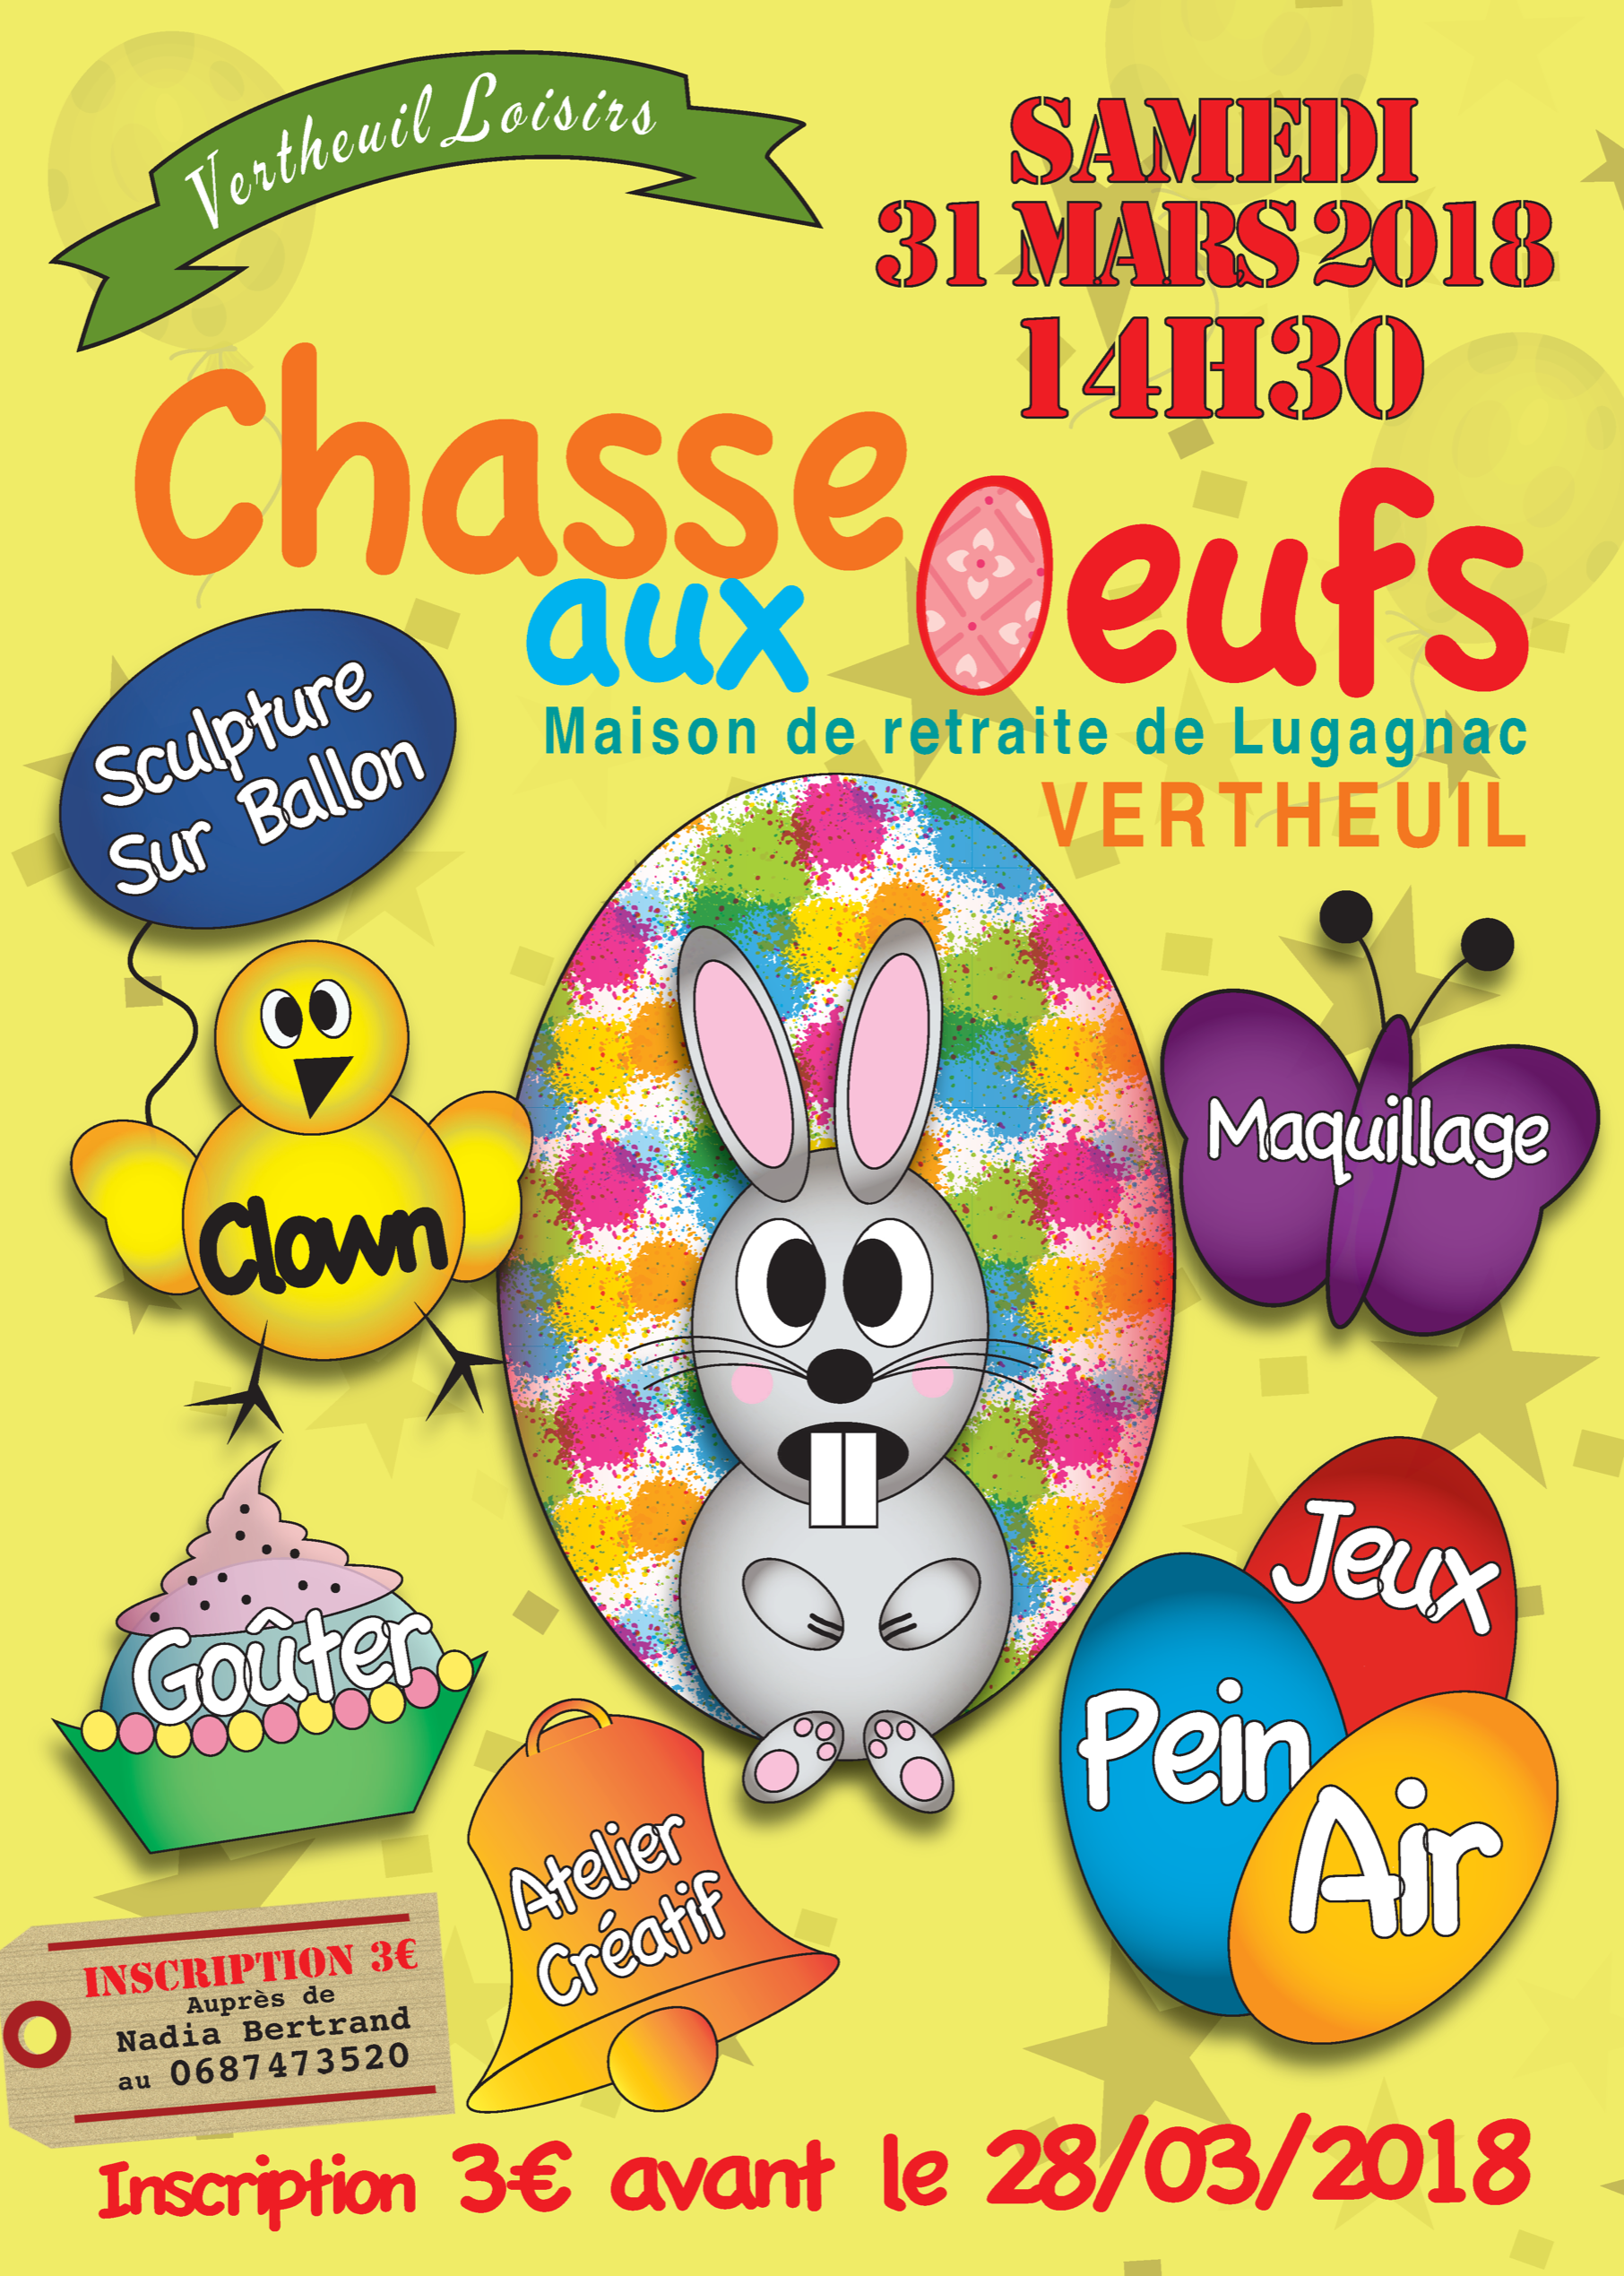 Affiche-VL-Chasseauxoeufs